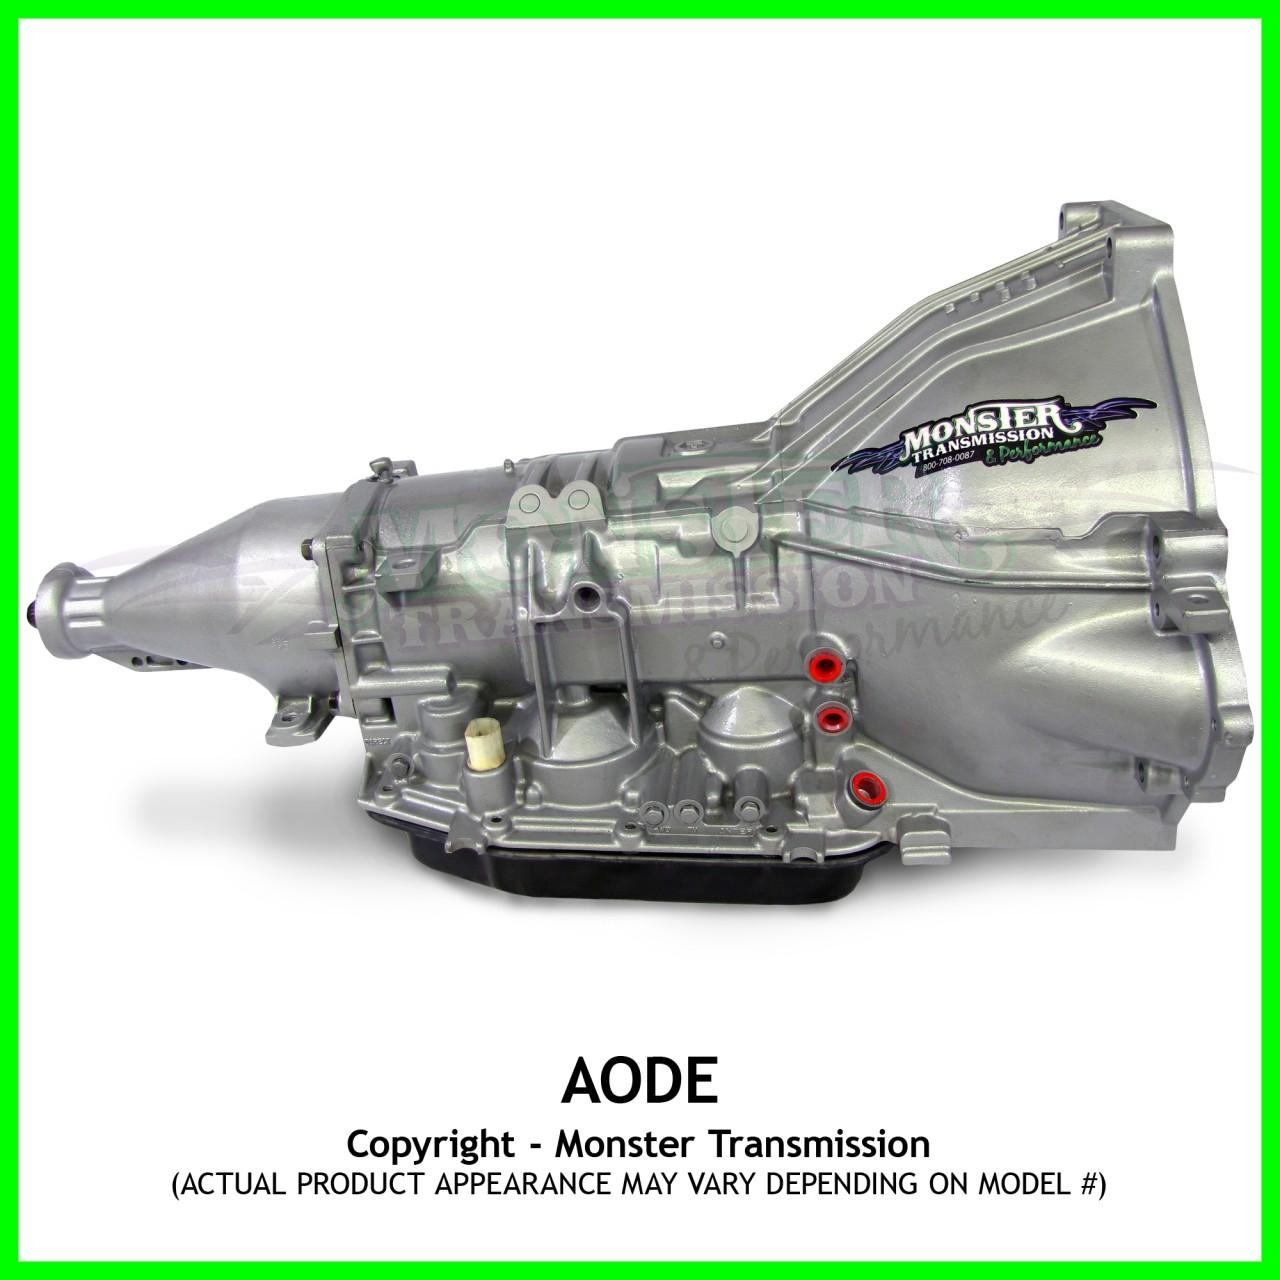 Aode Transmission Remanufactured Mild 2wd Ford Aode Transmission Rebuilt Aode Transmission